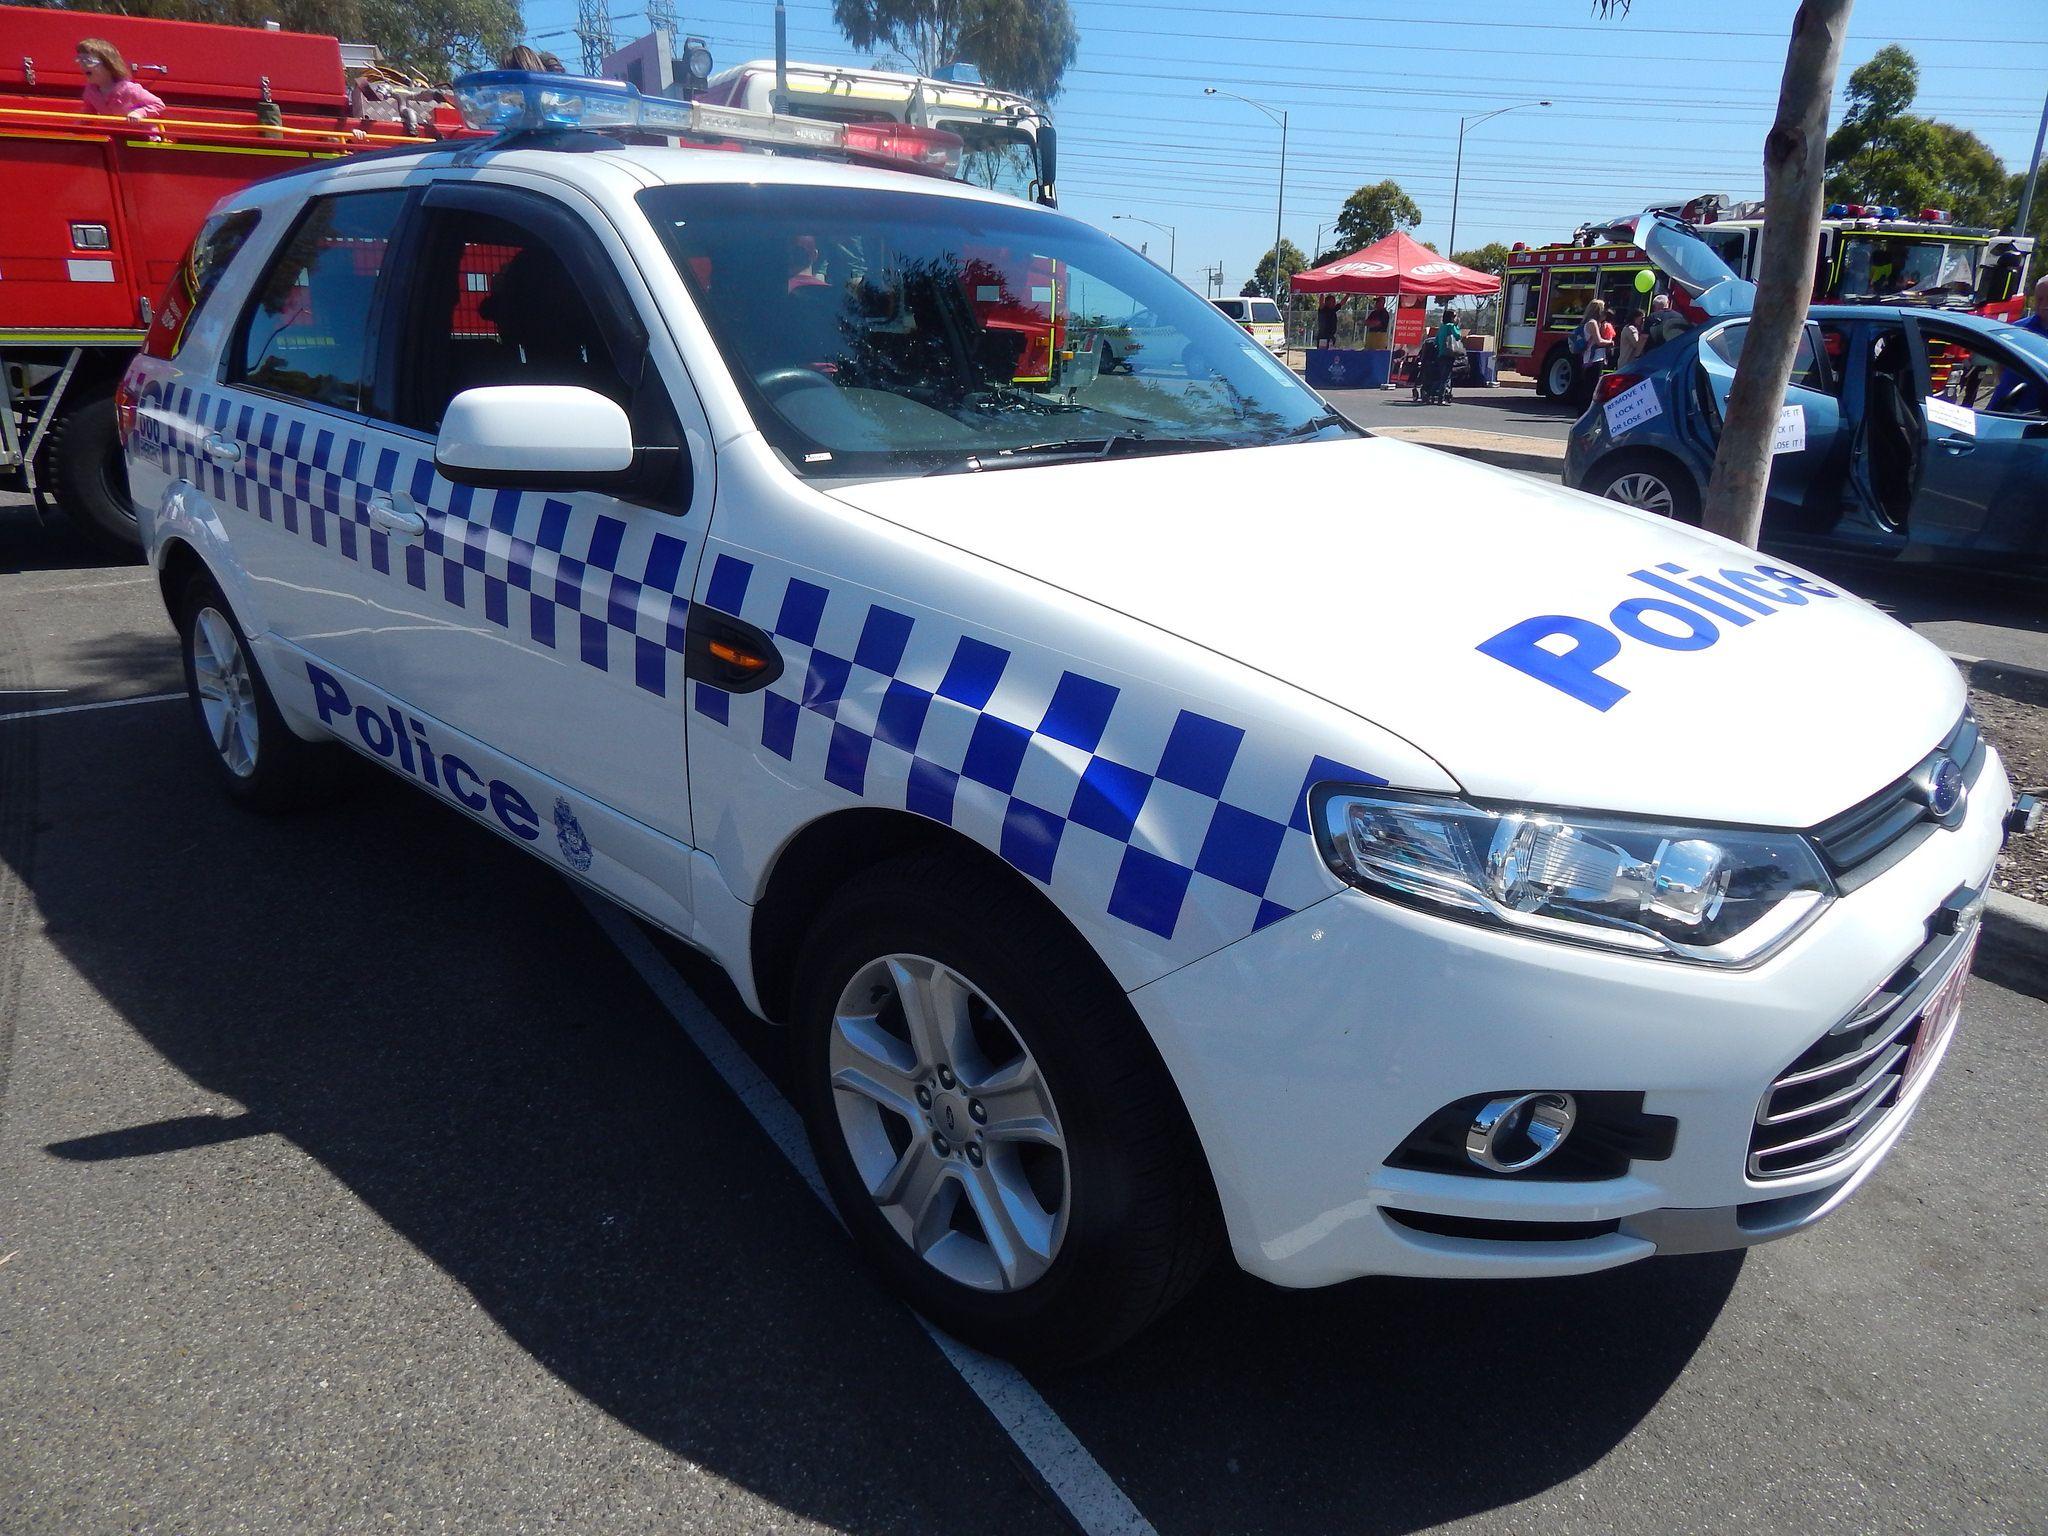 https//flic.kr/p/zCE5Ws Melbourne Victoria Police Ford